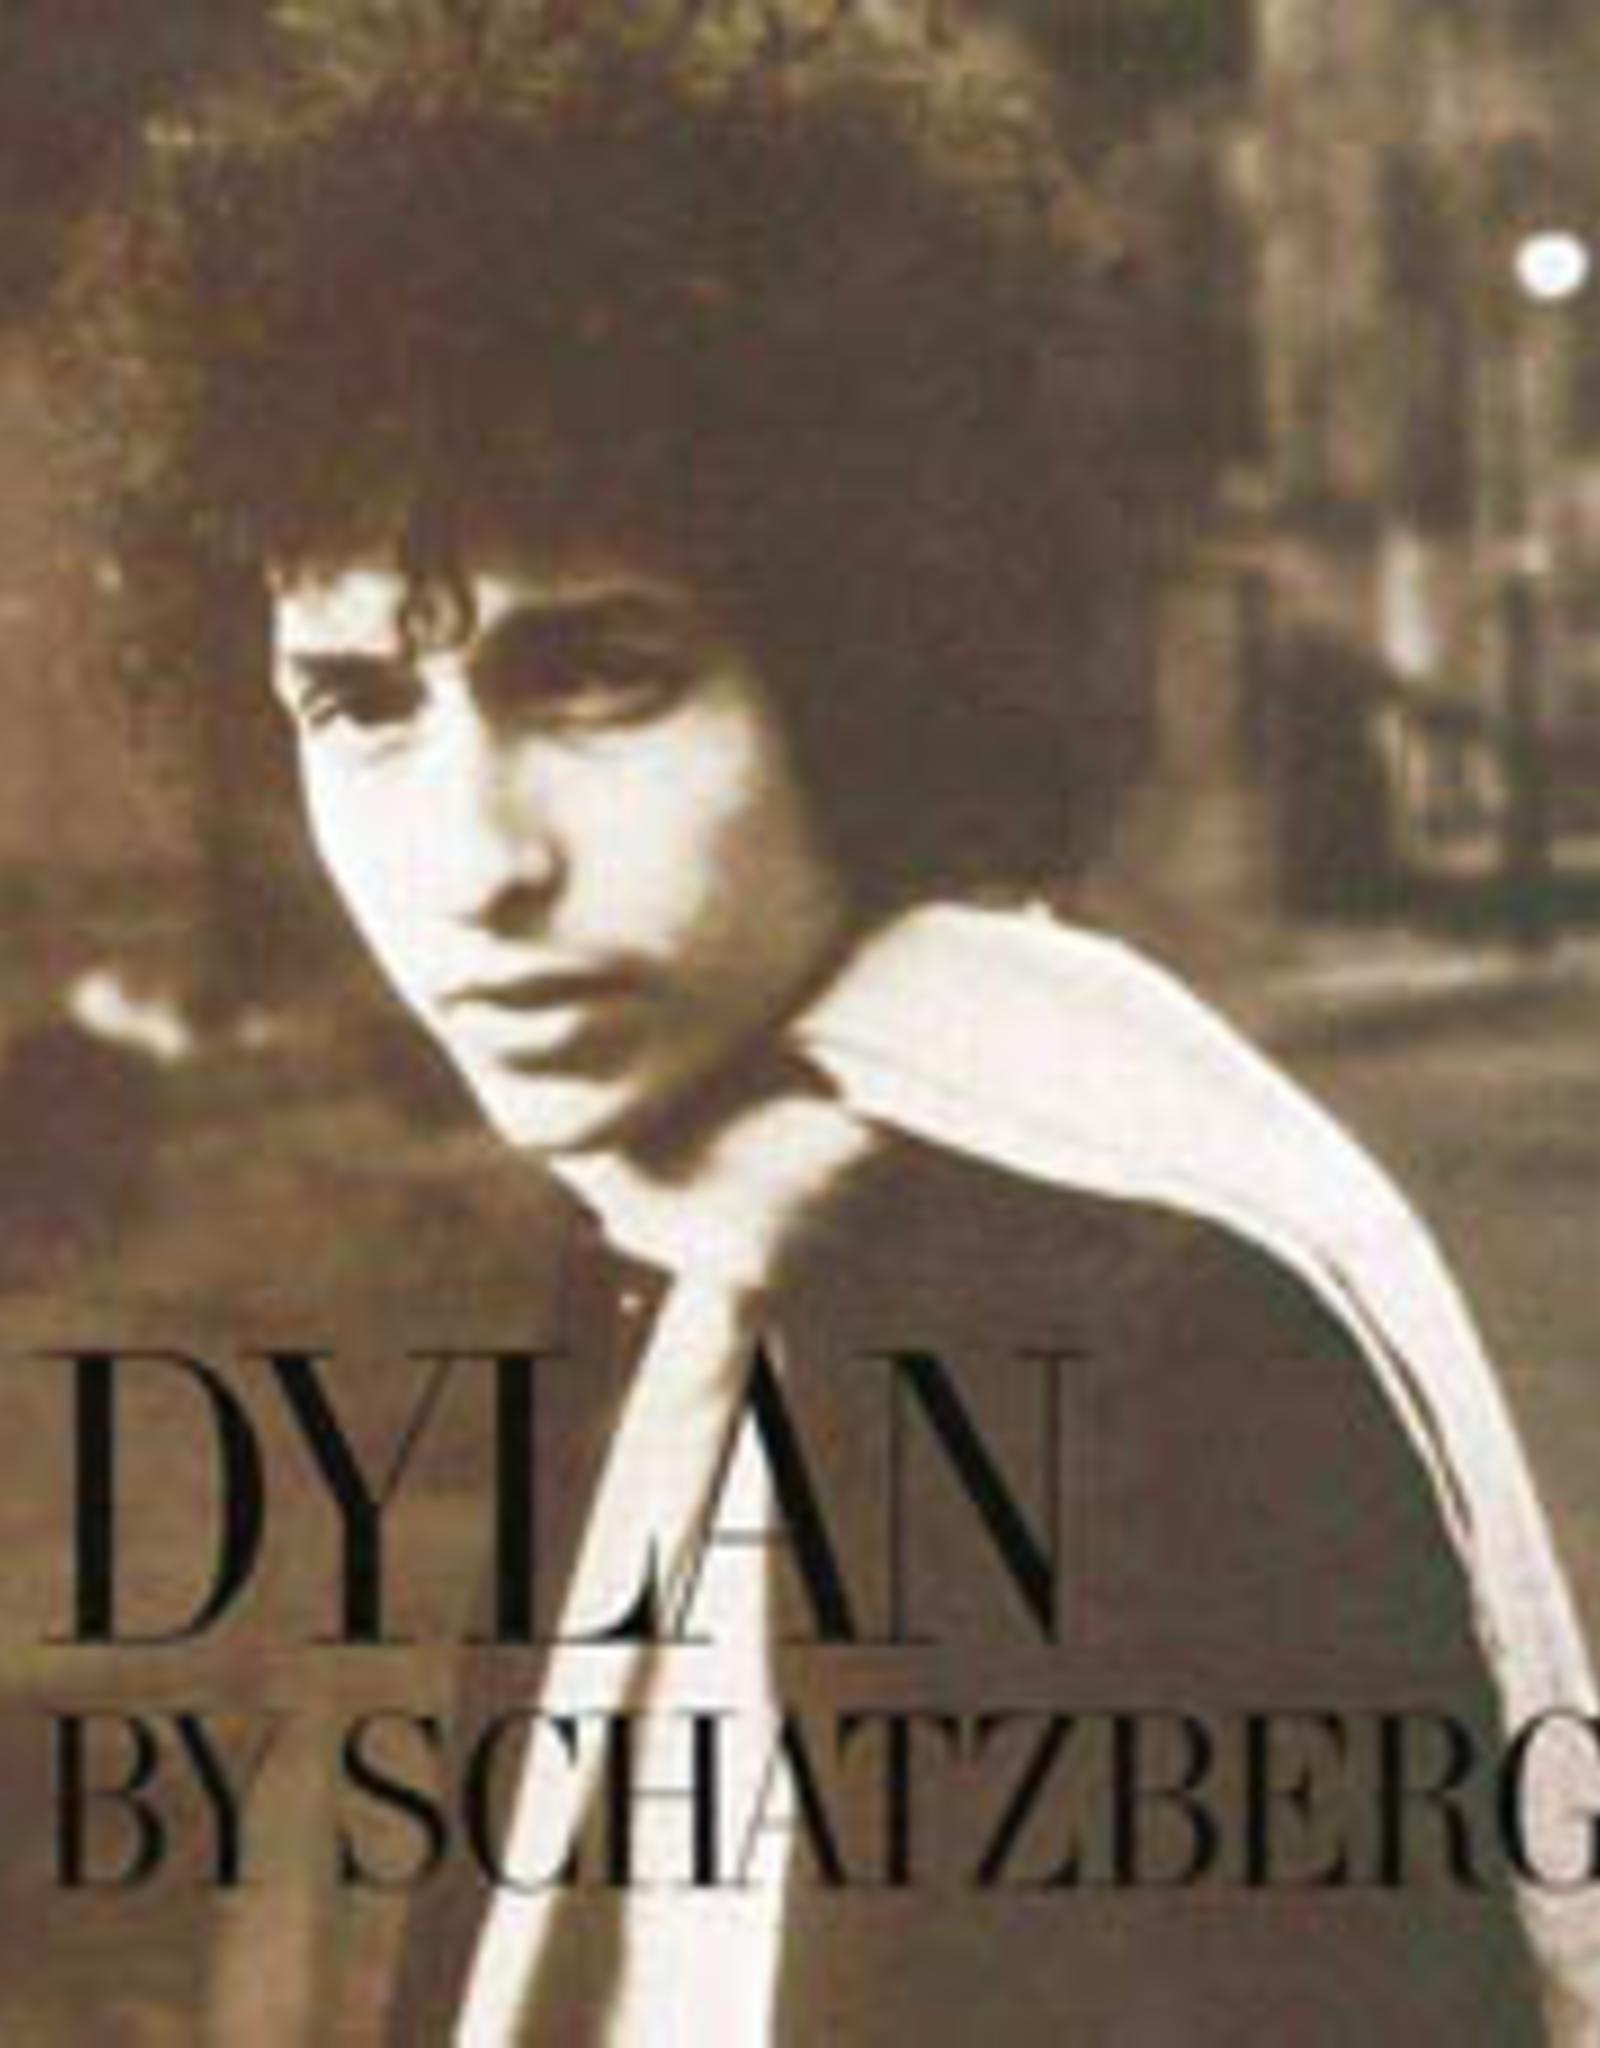 Website Dylan by Schatzberg